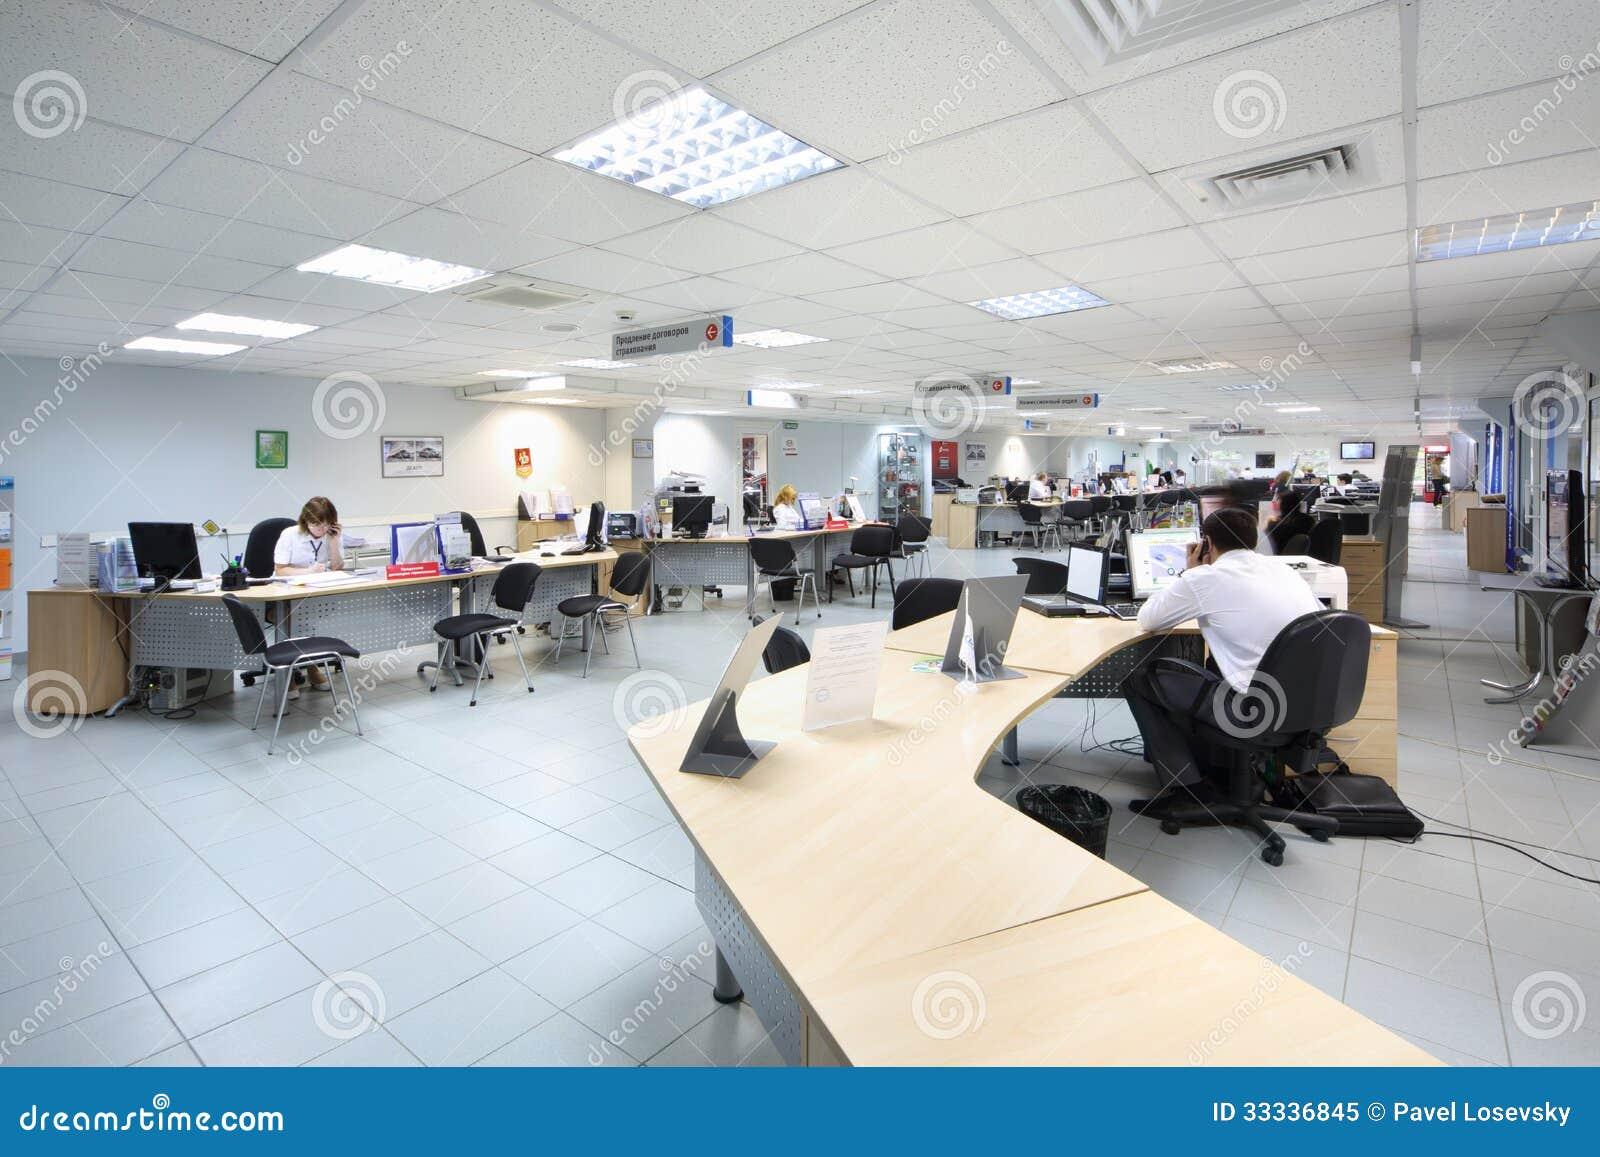 people work at computers in dealership avtomir editorial image image 33336845. Black Bedroom Furniture Sets. Home Design Ideas